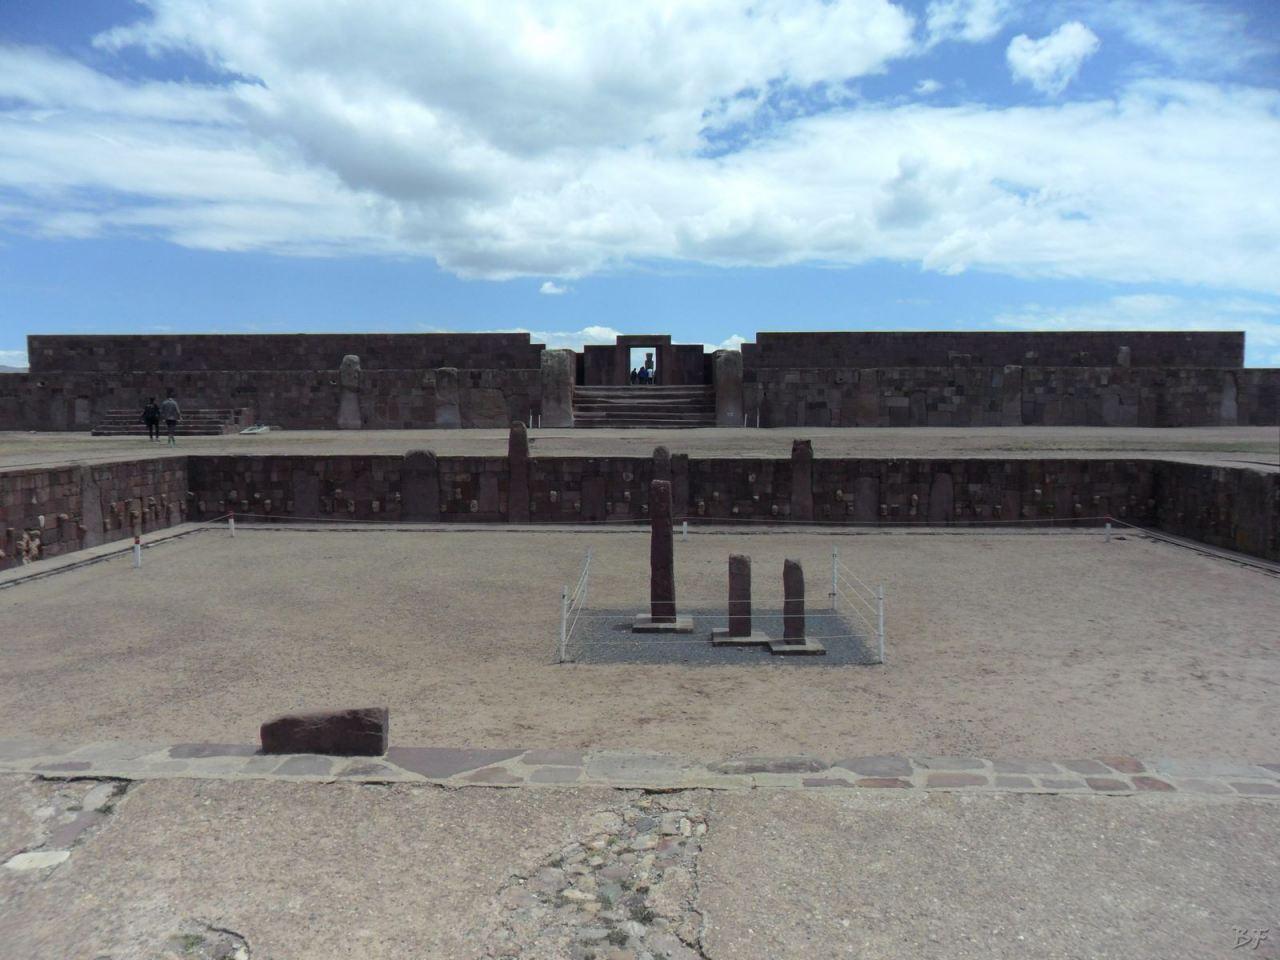 Sito-Megalitico-Piramide-Akapana-Kalasasaya-Menhir-Tiahuanaco-Bolivia-74